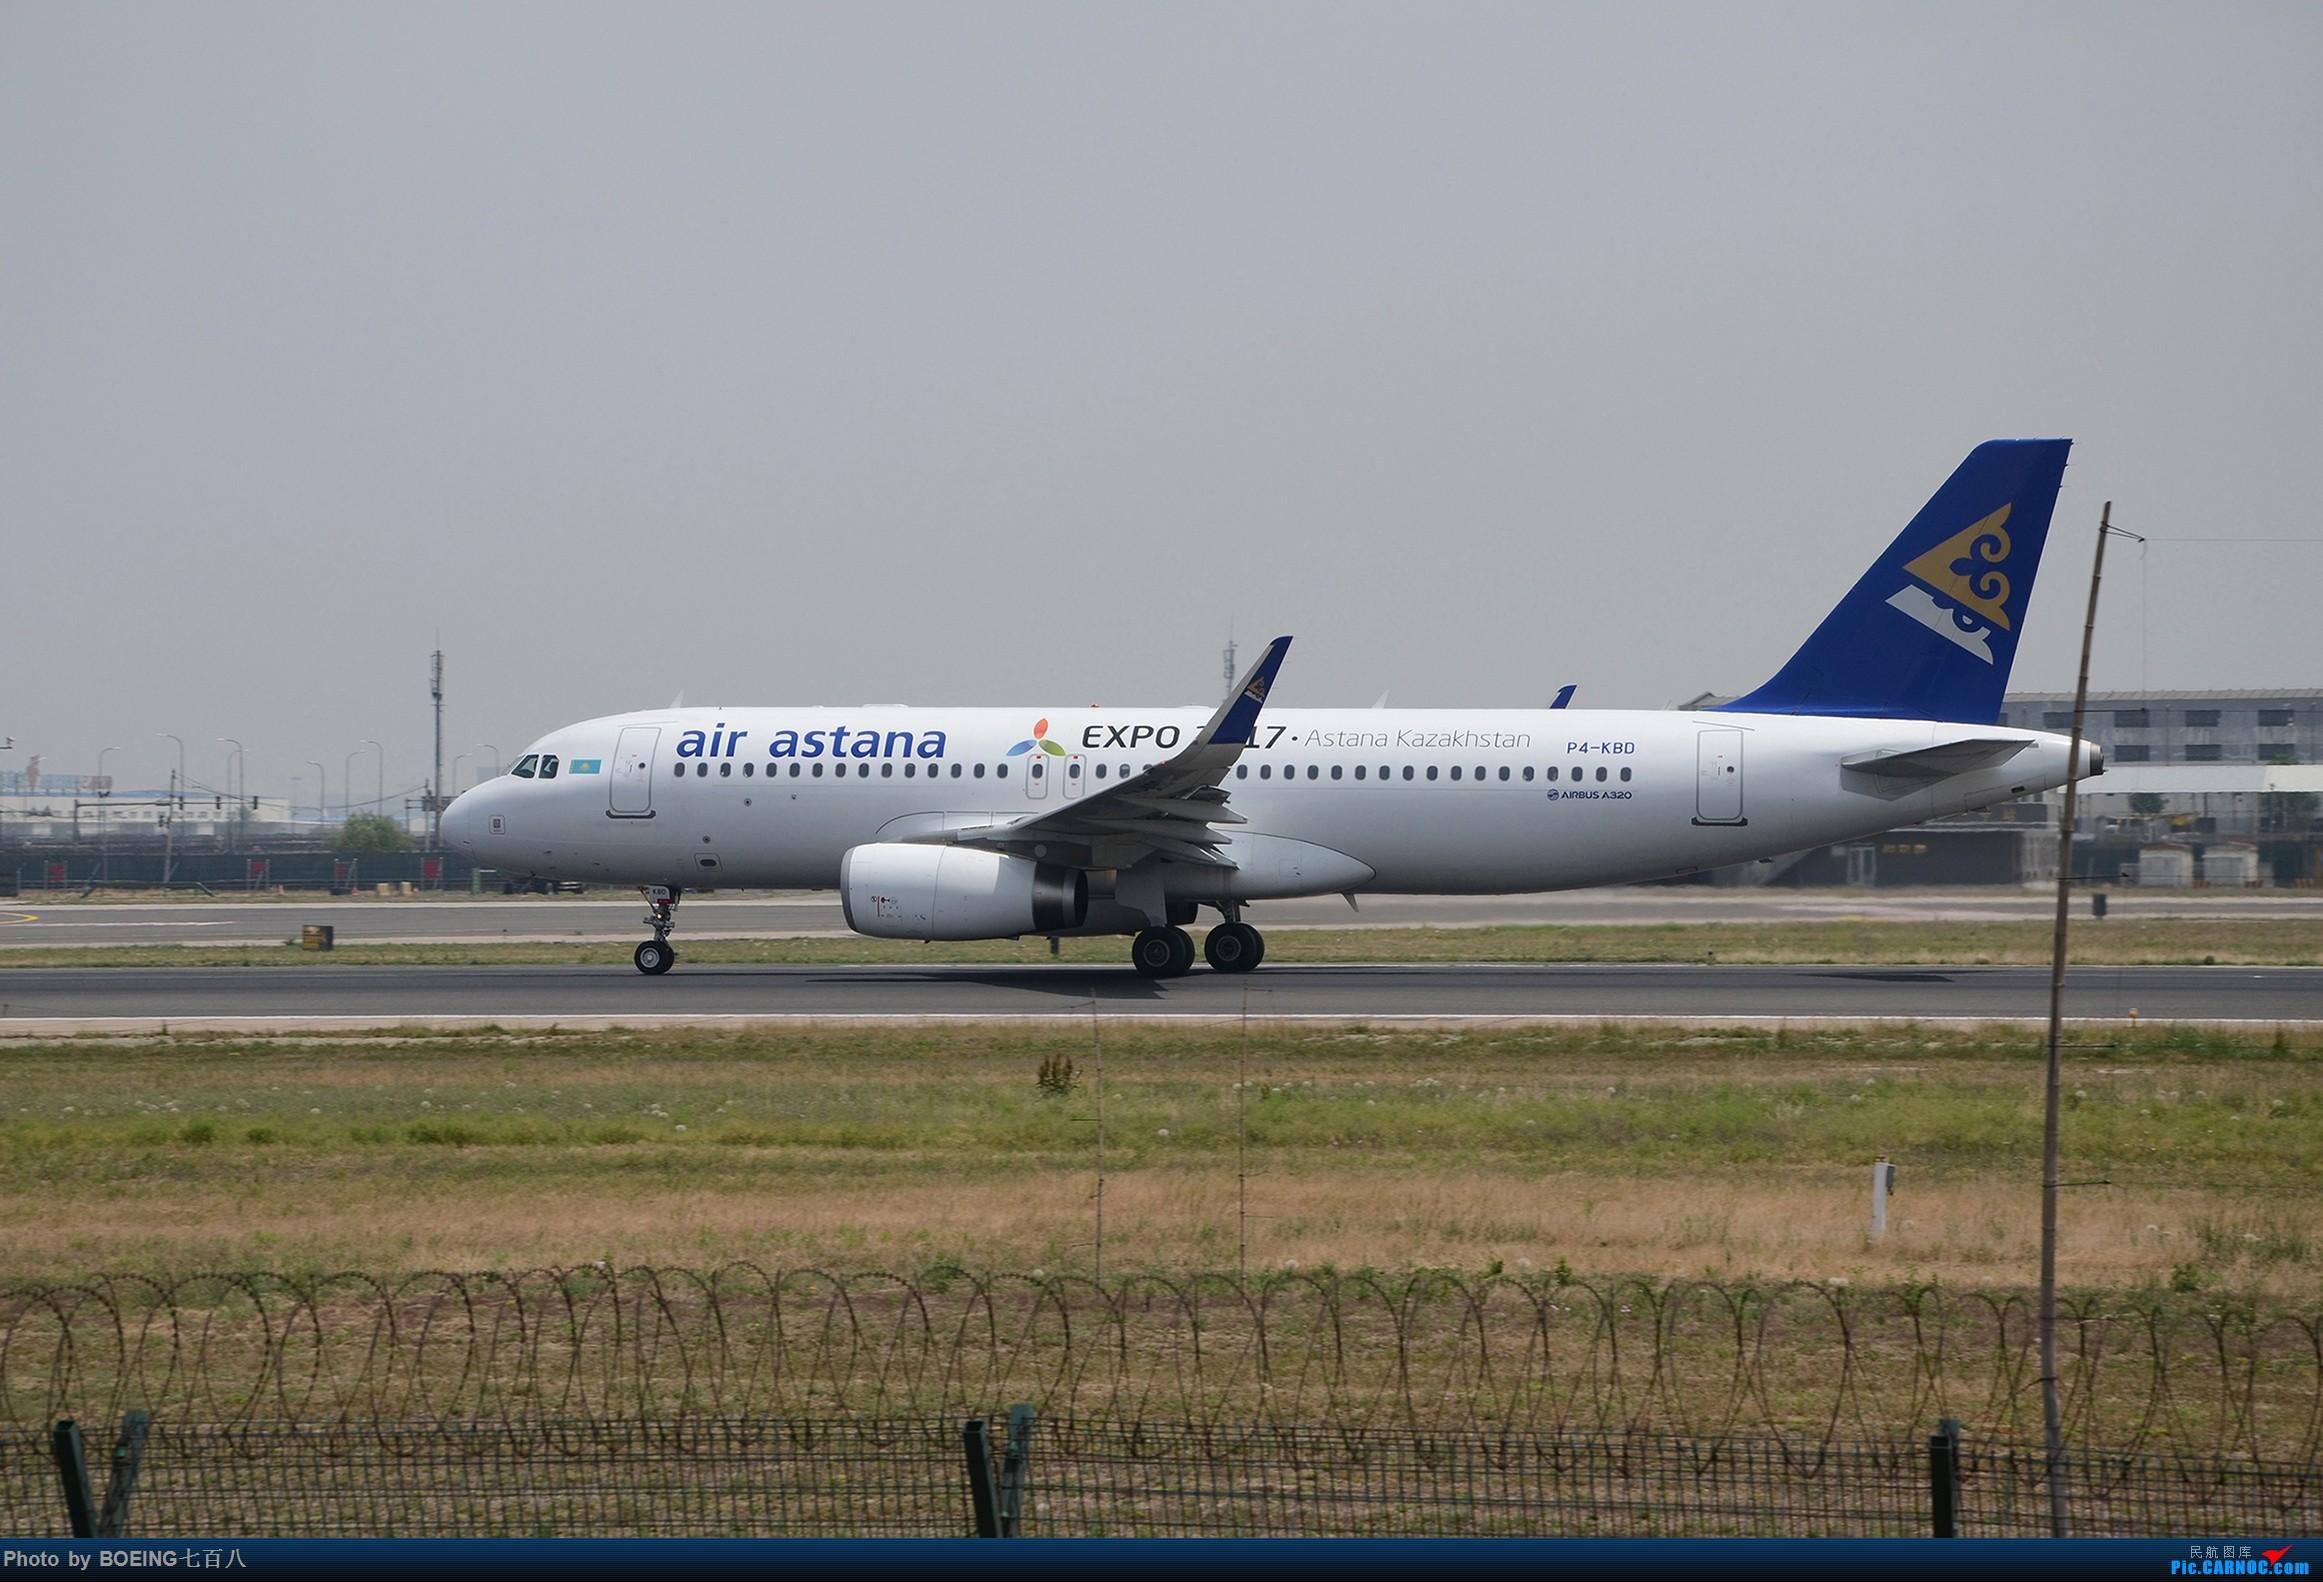 Re:[原创]海航家的黄焖熊猫和清蒸熊猫等好货 AIRBUS A320 P4-KBD 中国北京首都国际机场